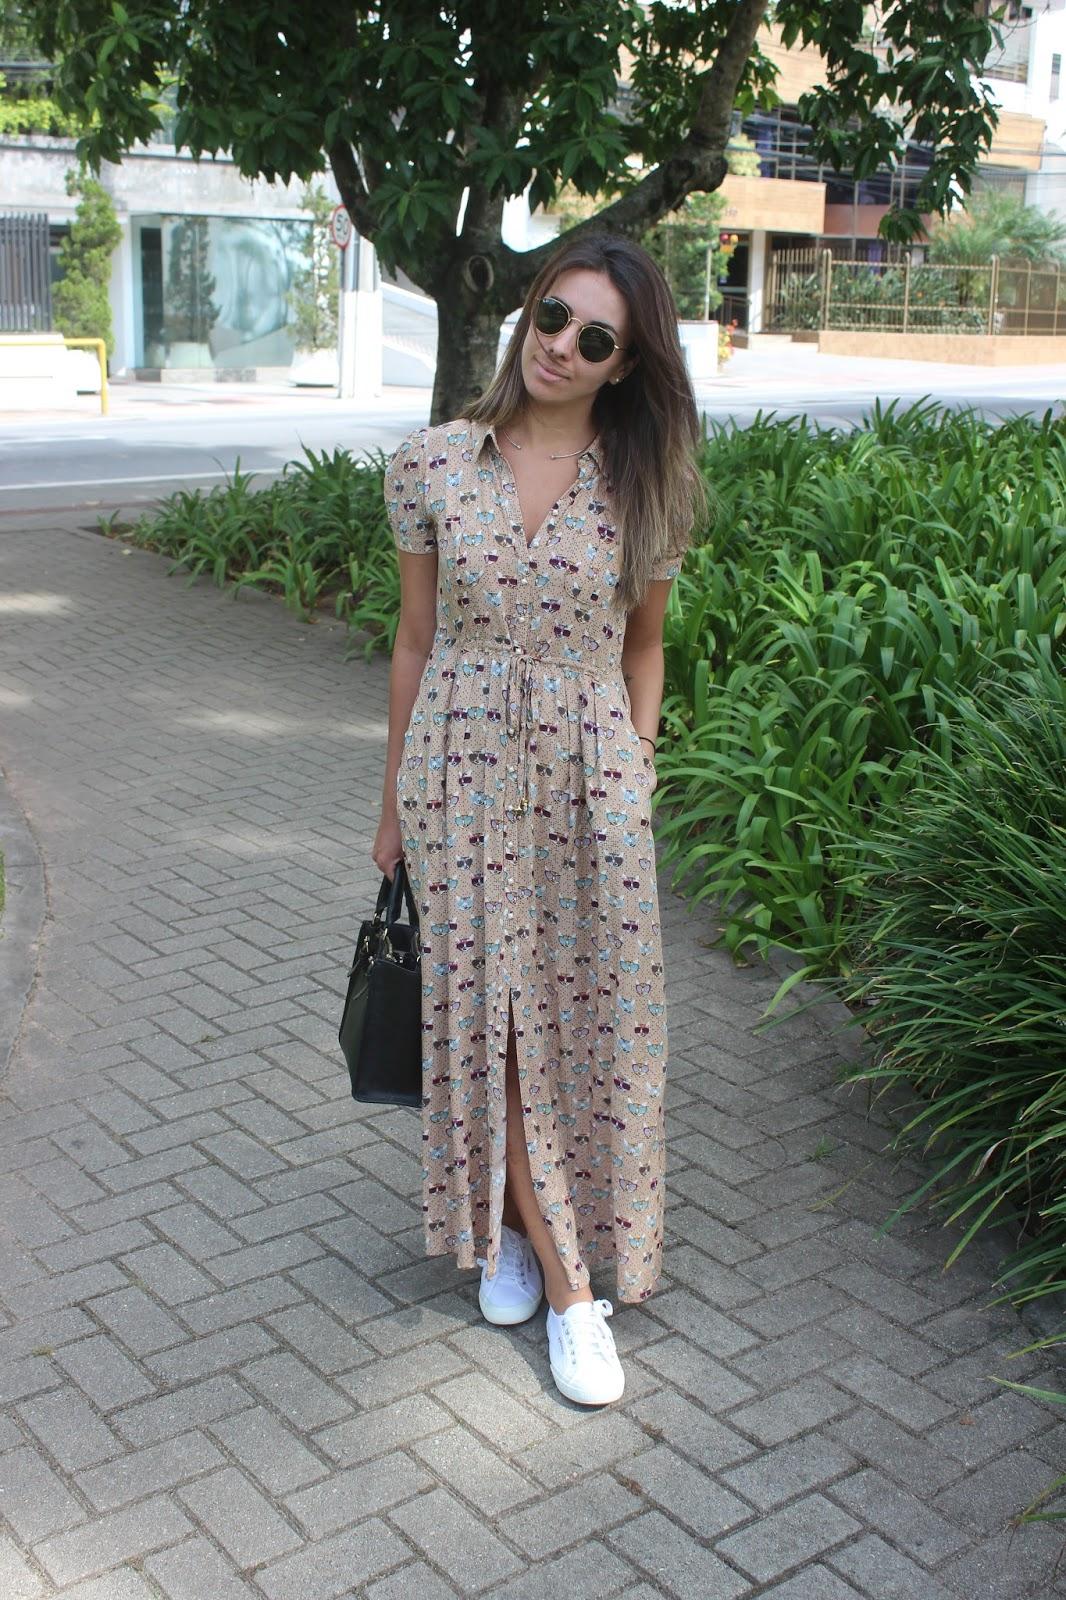 017719754 Blog da Nanda Pezzi: Look do dia: Vestido longo e Superga